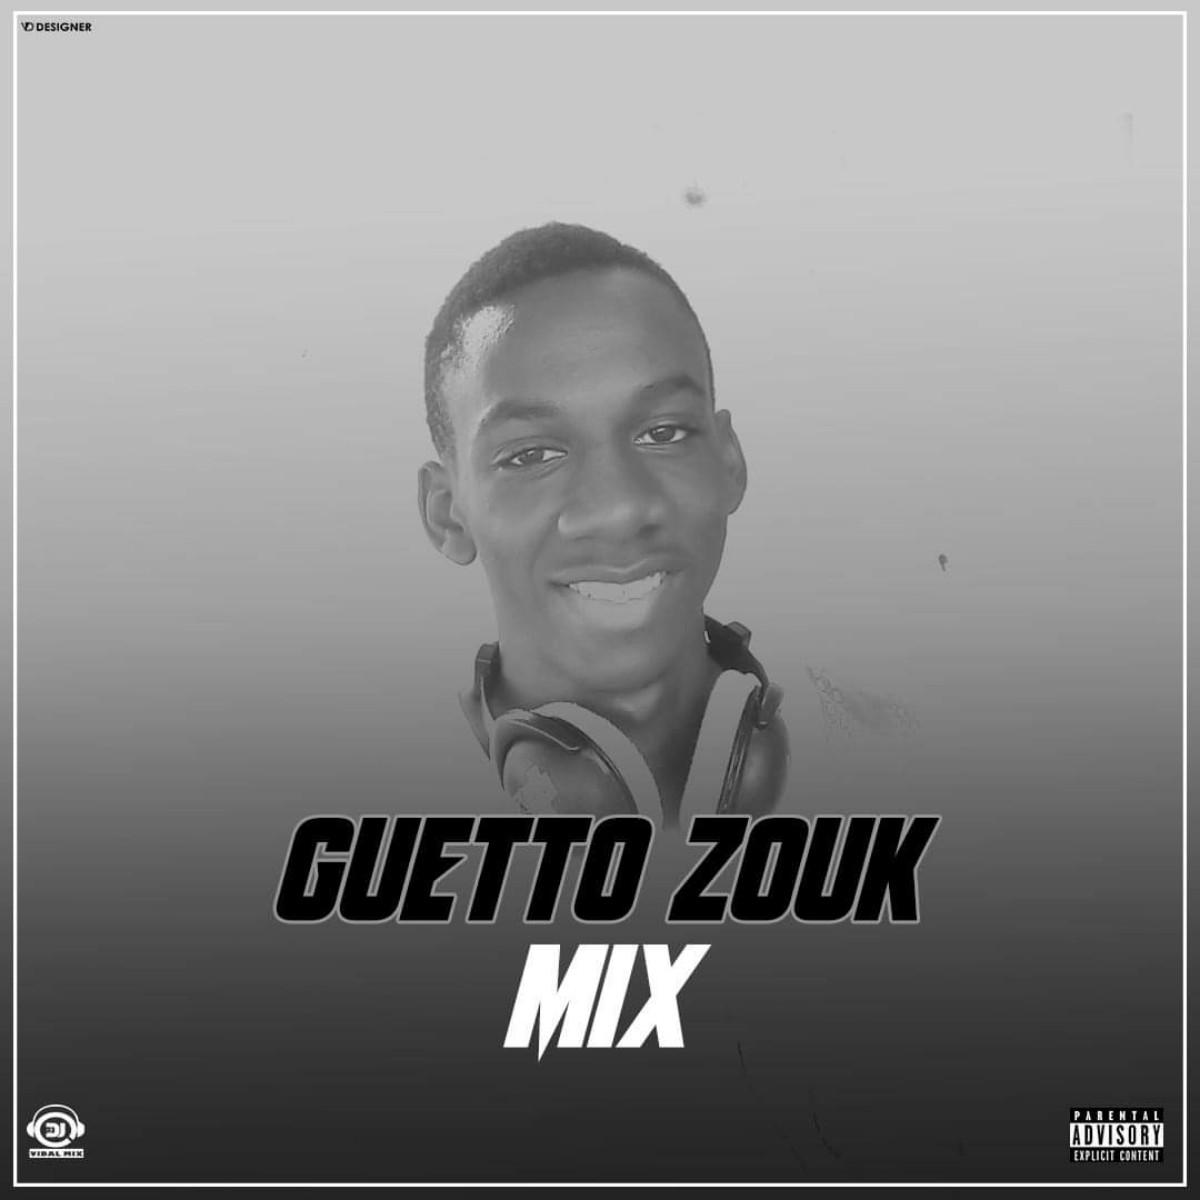 Dj Vidal Mix - Ghetto Zouk Mix Vol. 1